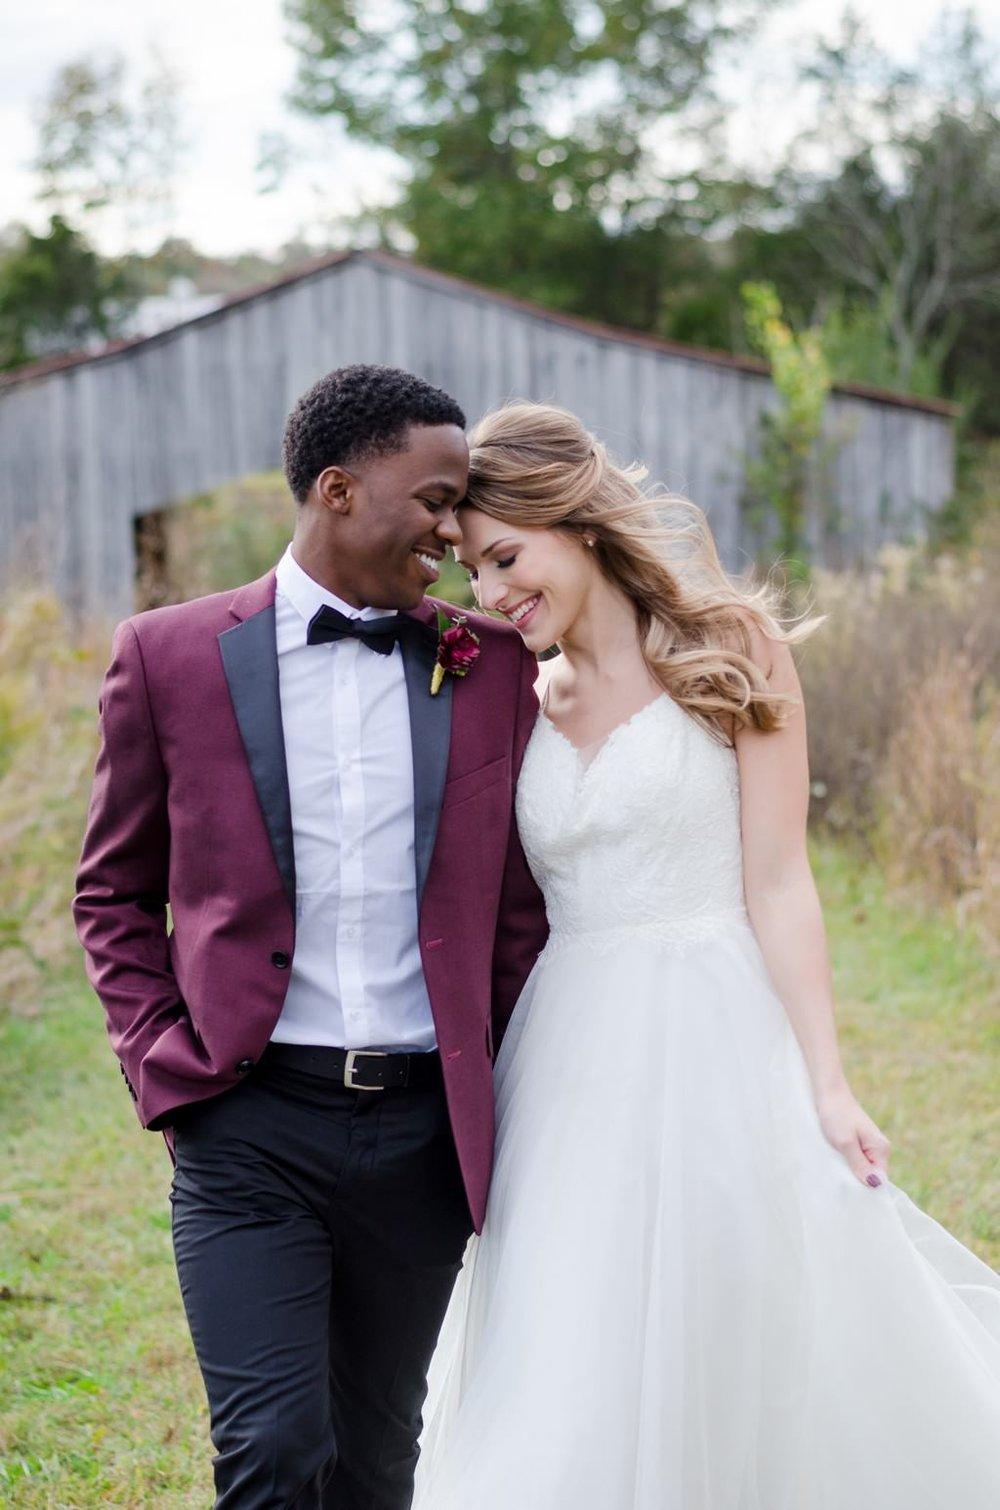 Iriswoods-Mt-Juliet-Blush-and-Burgundy-Nashville-Wedding-Photographer+15